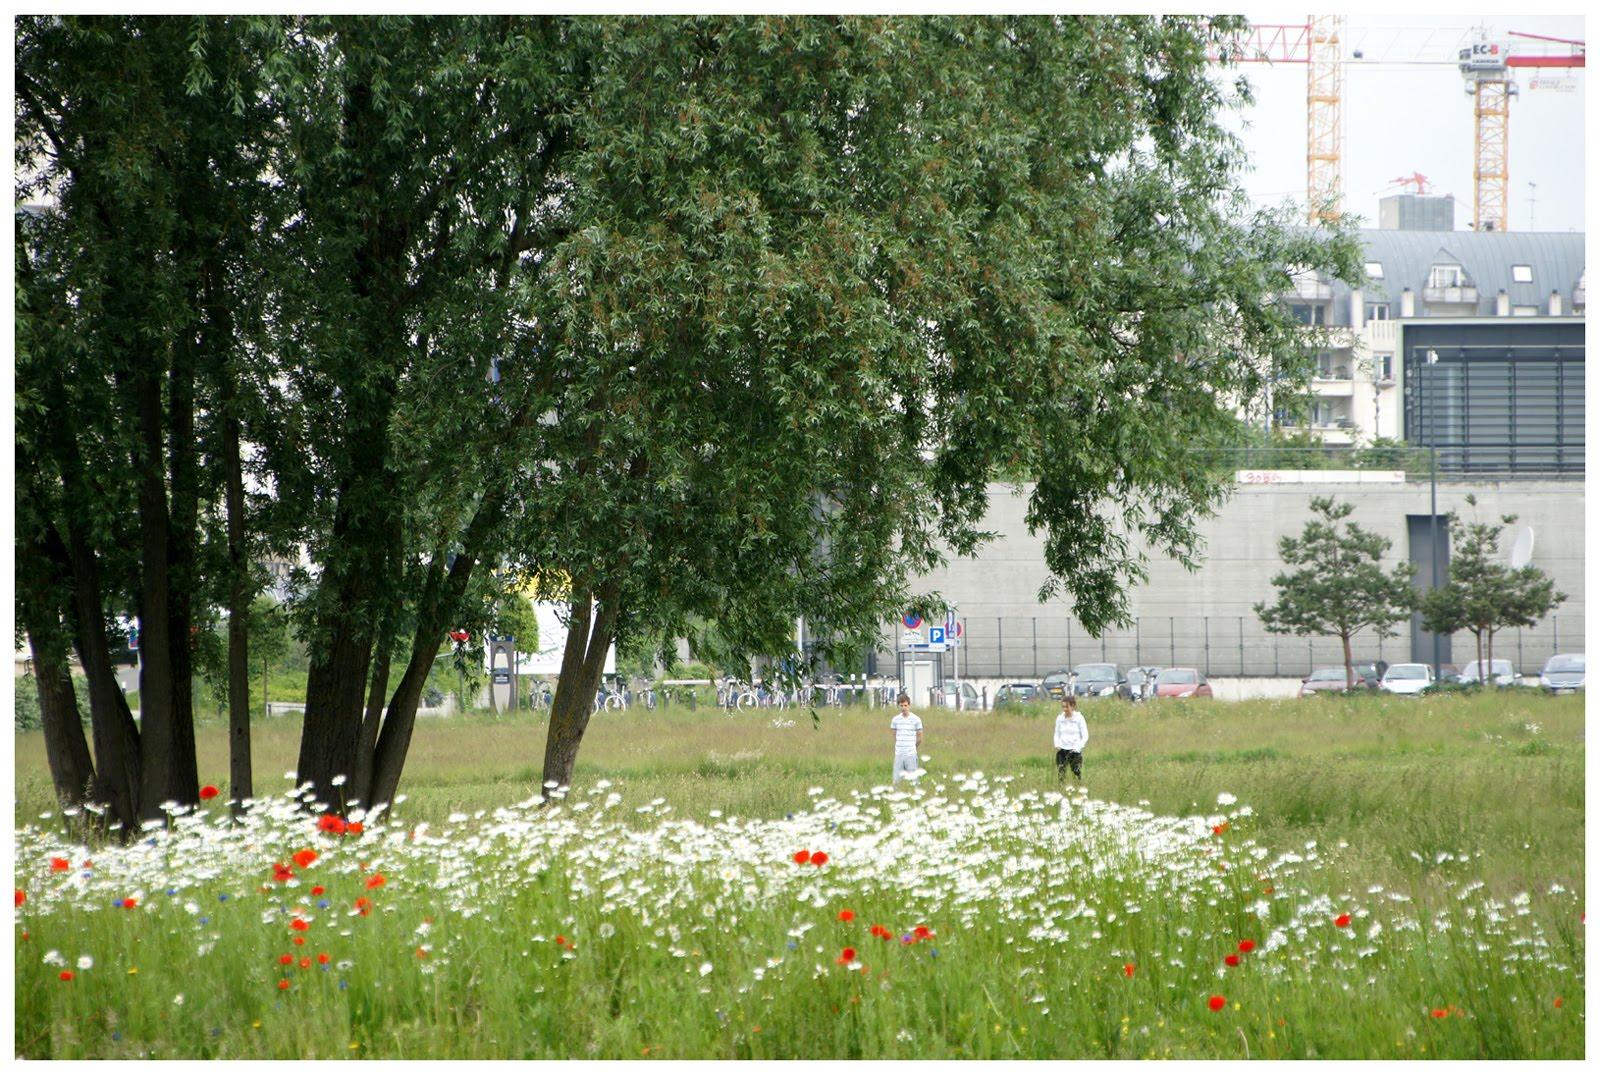 cergipontin cergy le haut 95 les saules willows. Black Bedroom Furniture Sets. Home Design Ideas